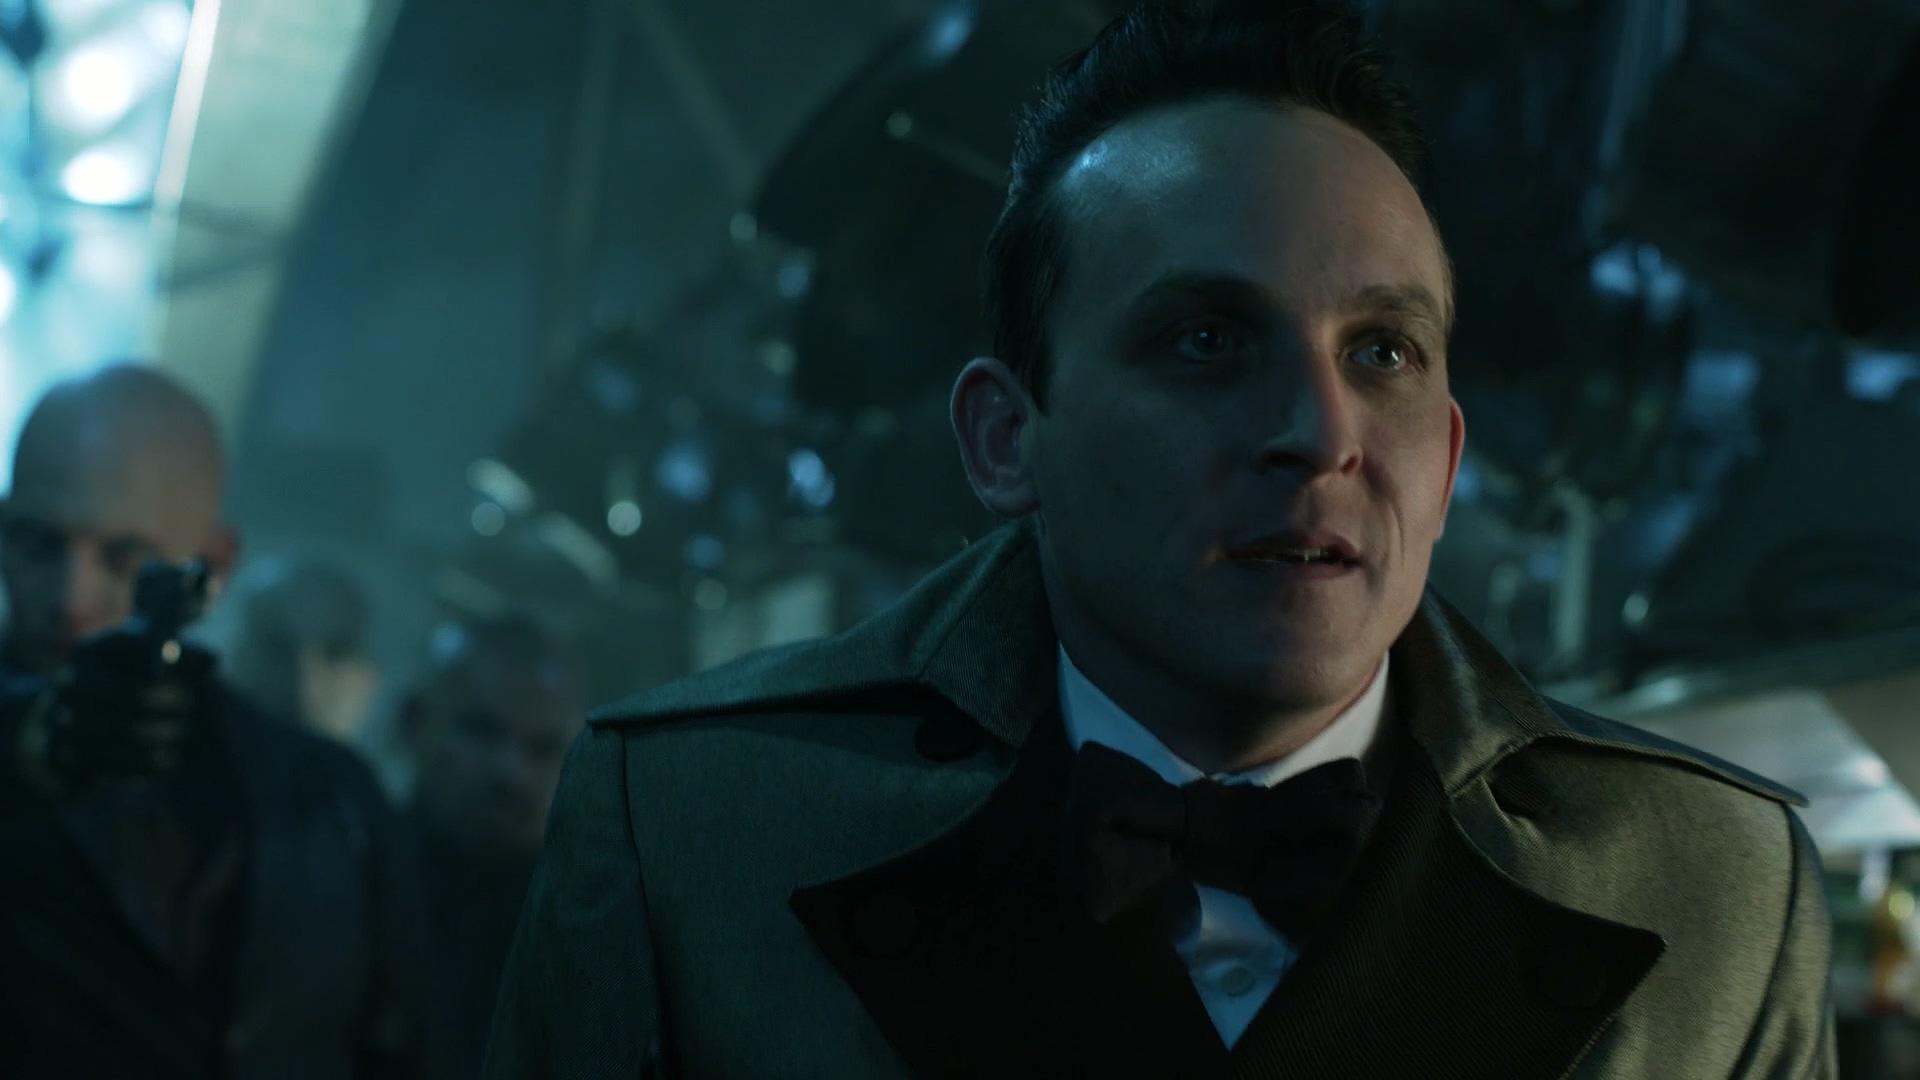 Готэм / Gotham [04x01-05 из 22] (2017) WEB-DLRip 1080p   IdeaFilm